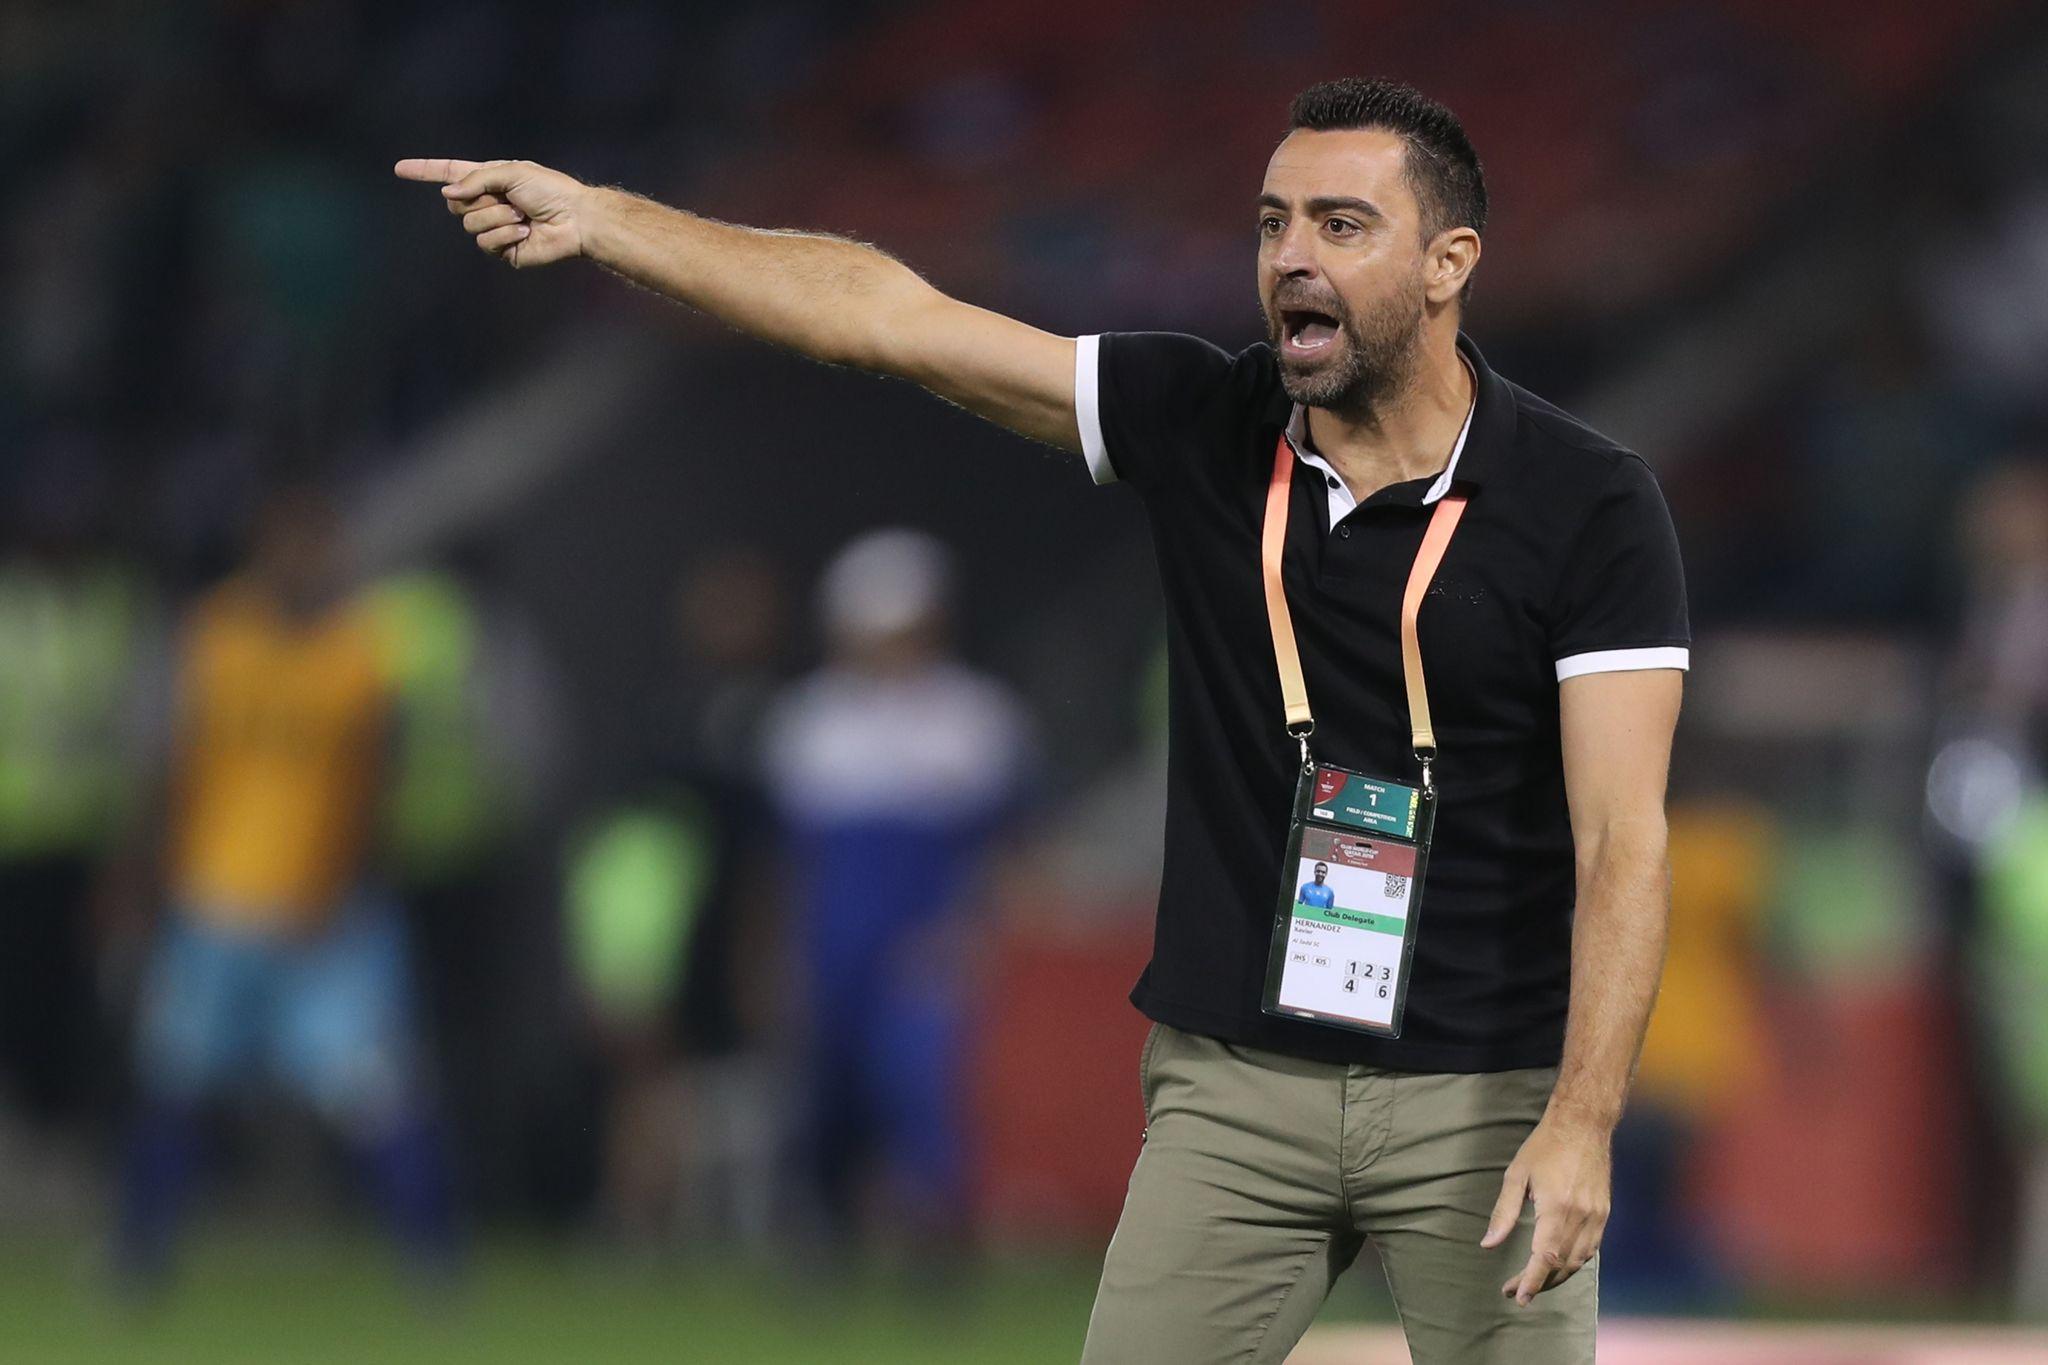 Sadds coach lt;HIT gt;Xavi lt;/HIT gt; reacts during the 2019 FIFA Club World Cup football match between Qatars Al-Sadd and New Caledonias Hienghene Sport at the Jassim Bin Hamad Stadium in the Qatari capital Doha on December 11, 2019. (Photo by KARIM JAAFAR / AFP)